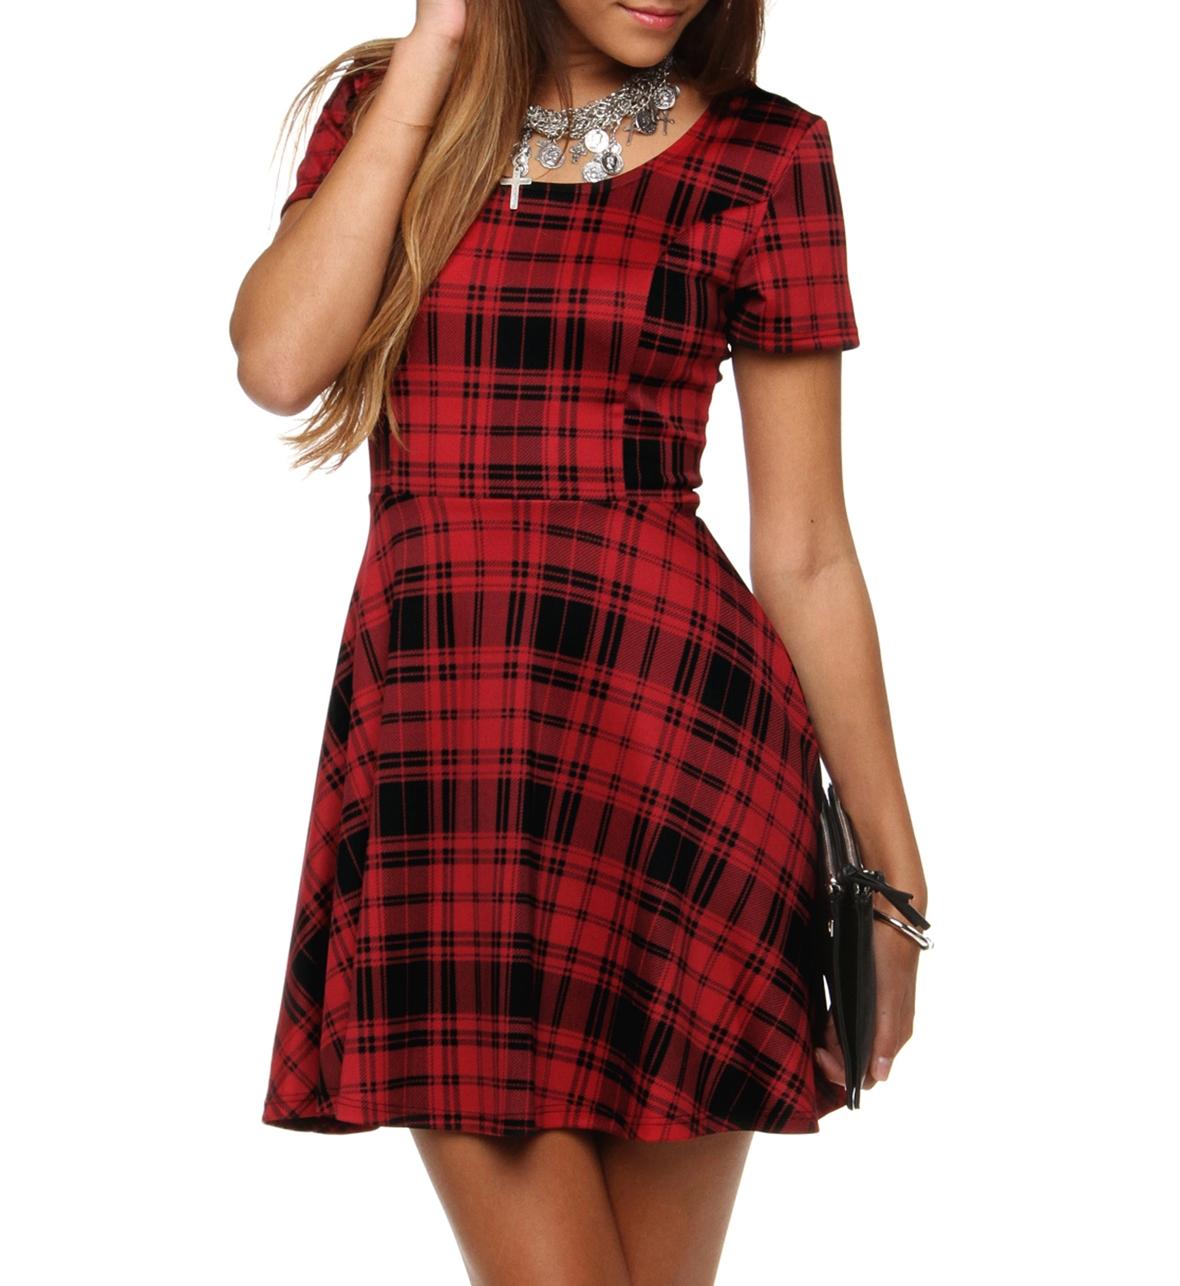 Red oh so popular plaid skater dress